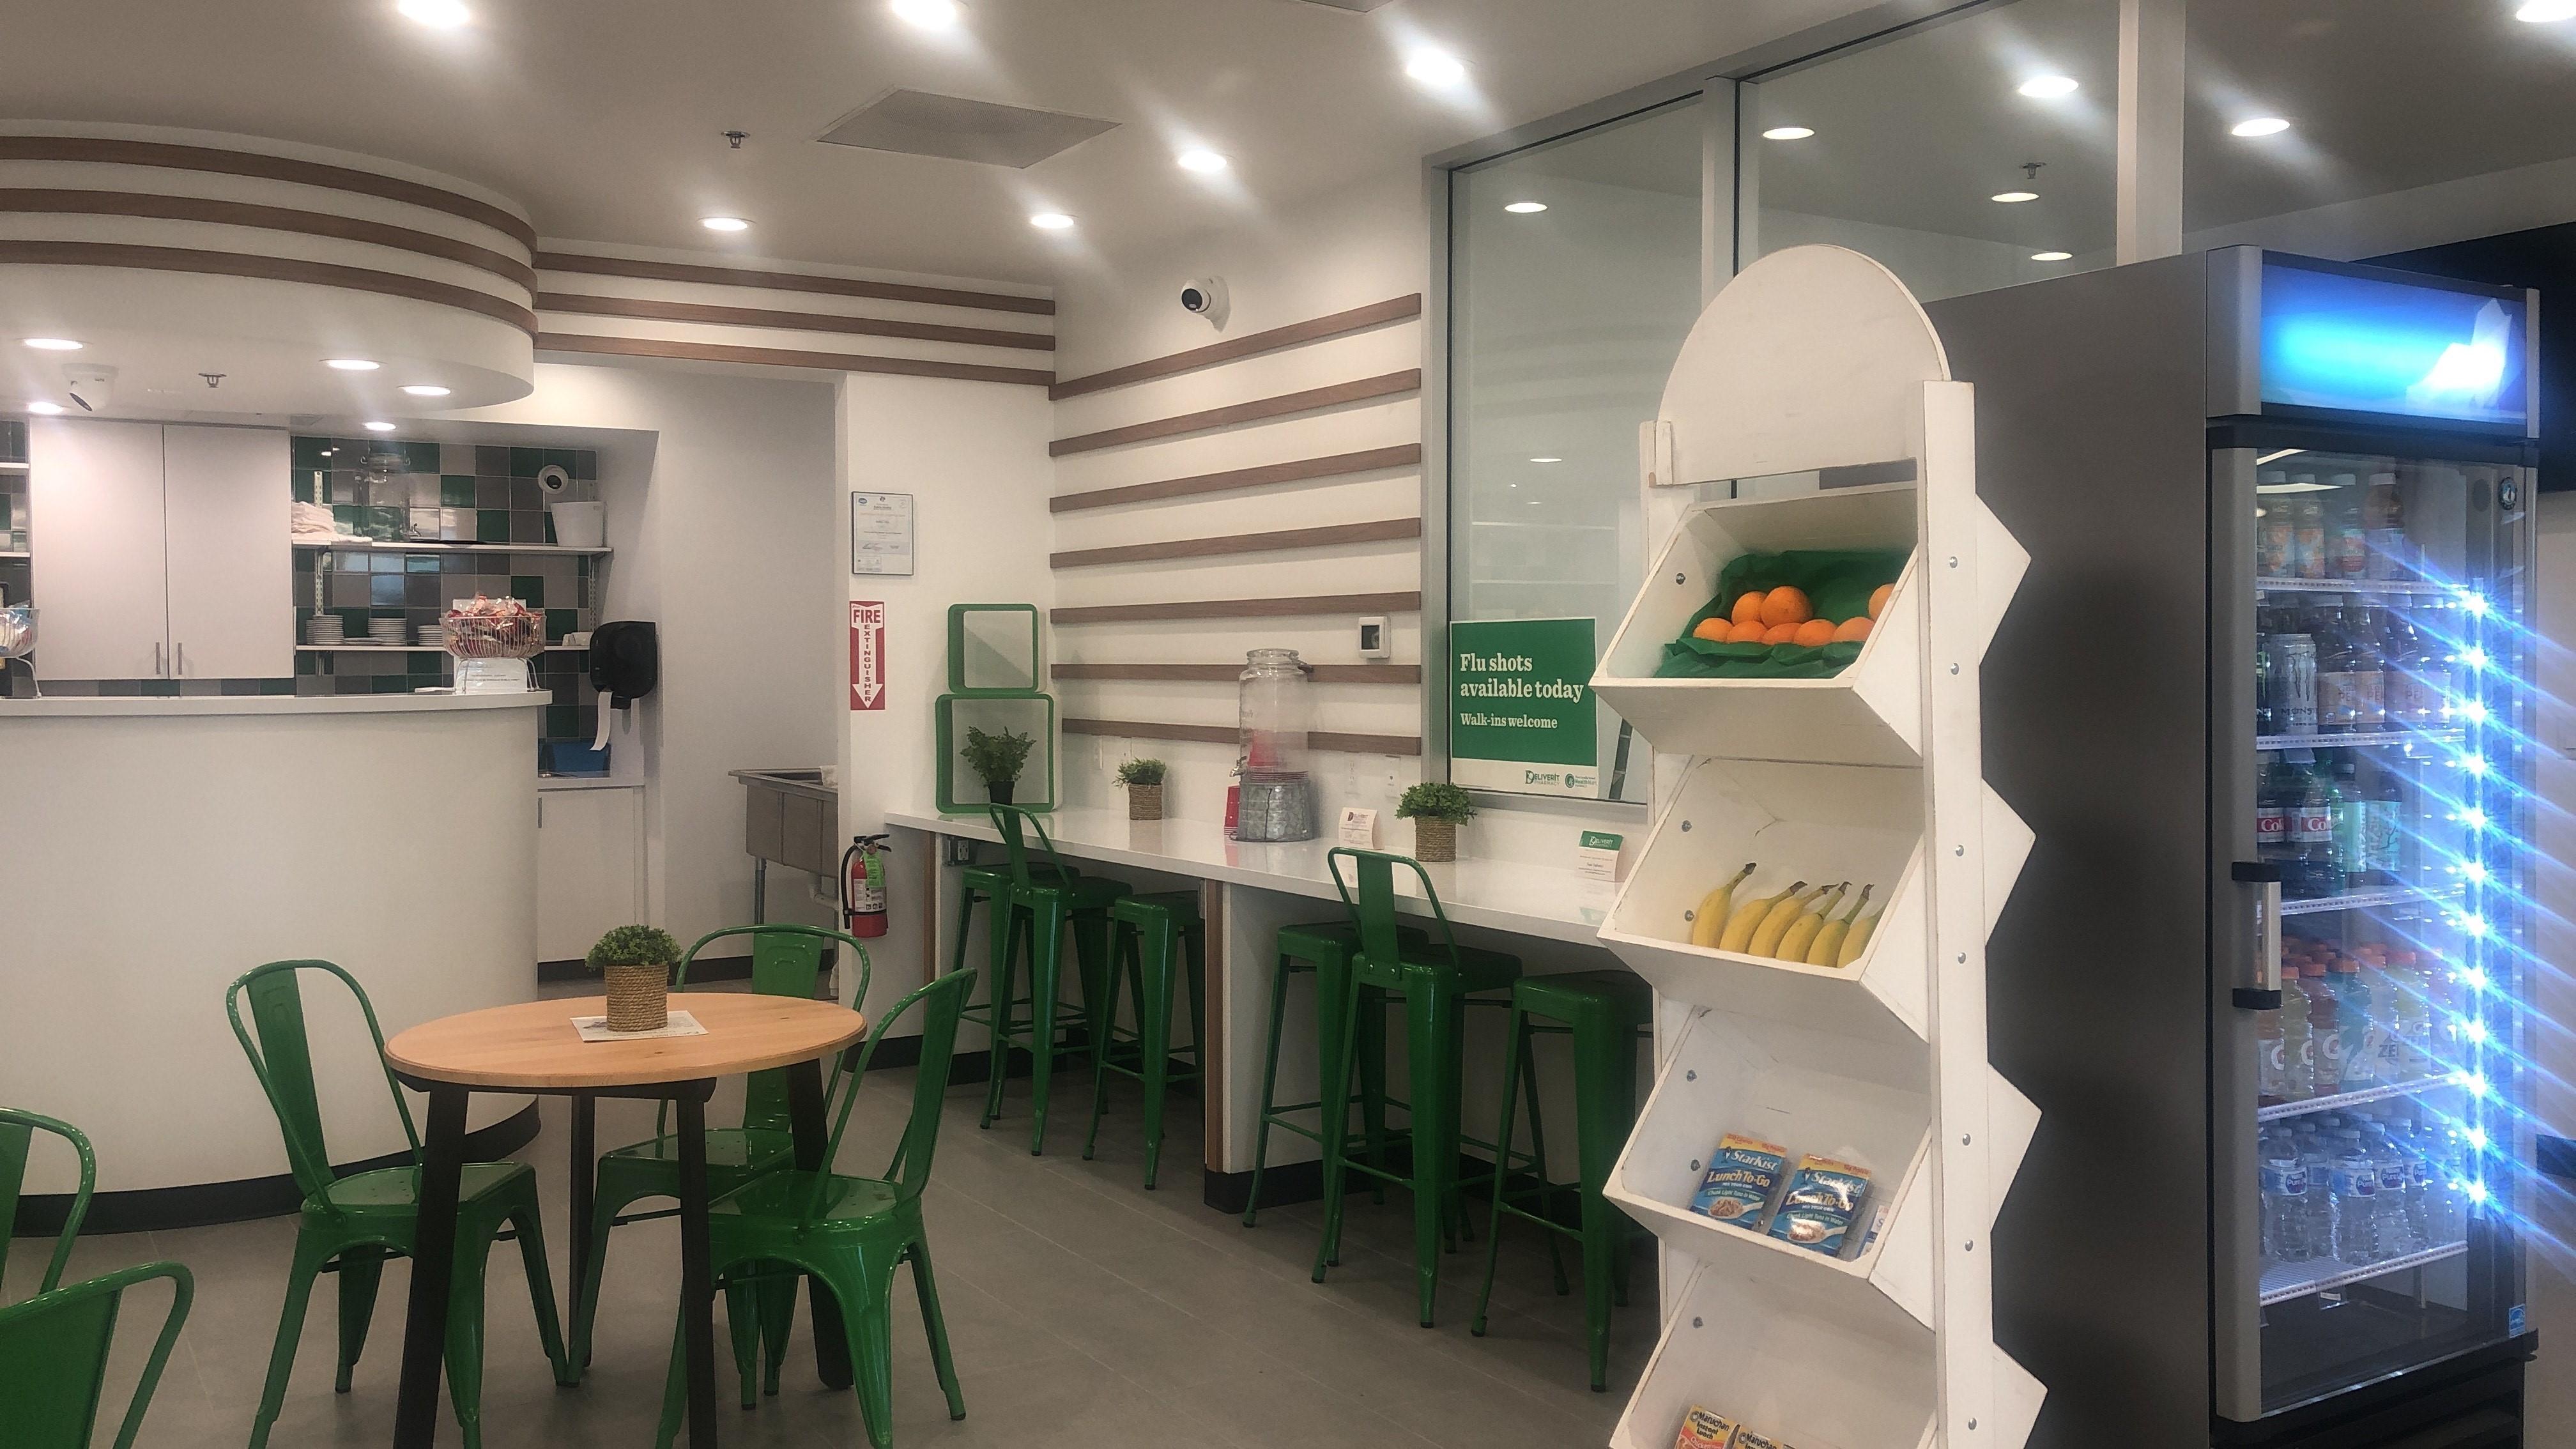 Coffee corner seating